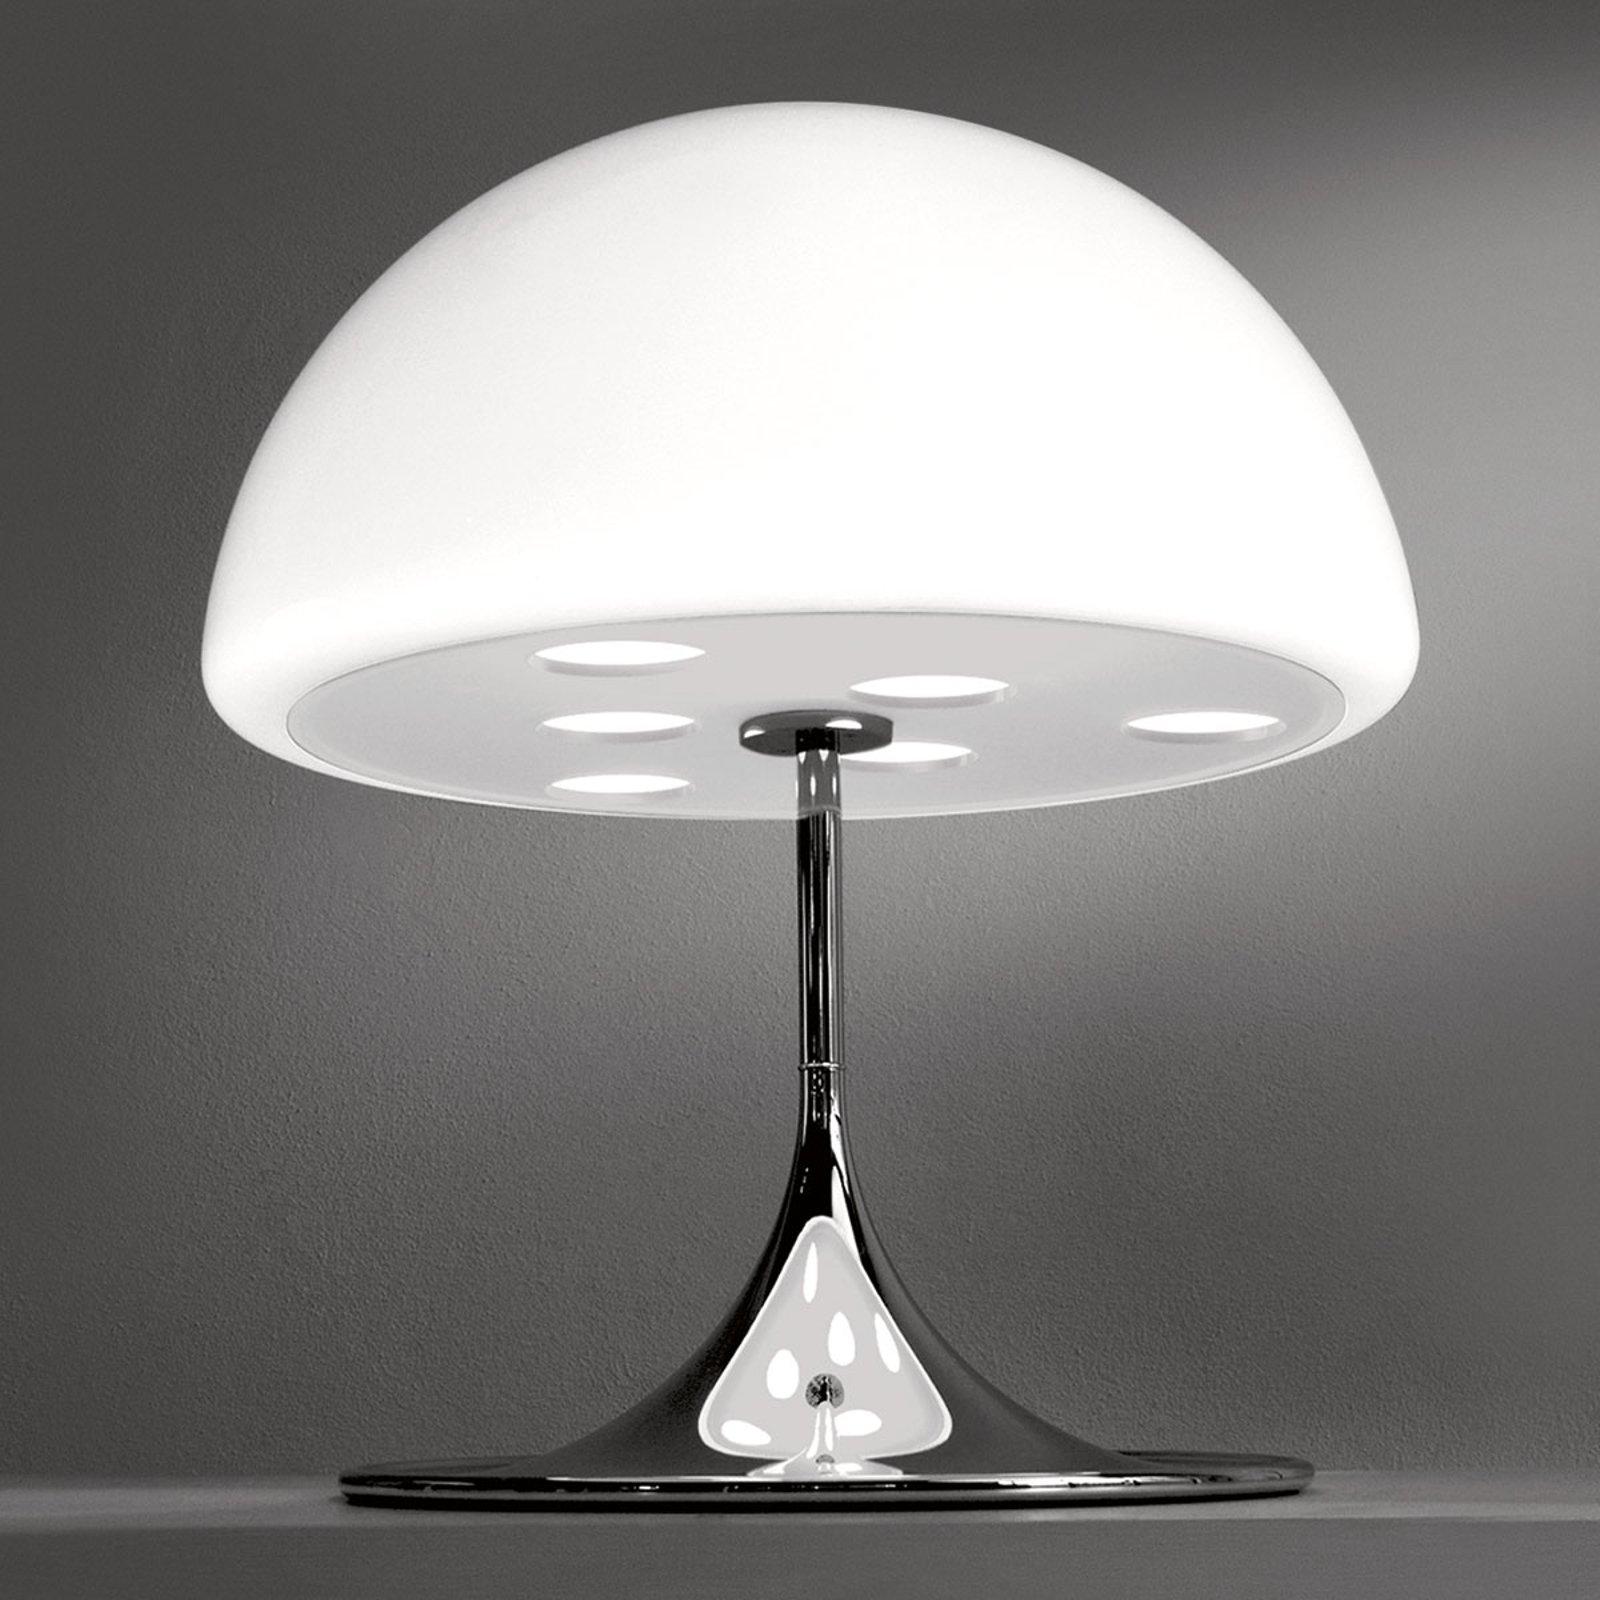 Martinelli Luce Mico – bordlampe 60 cm, hvit